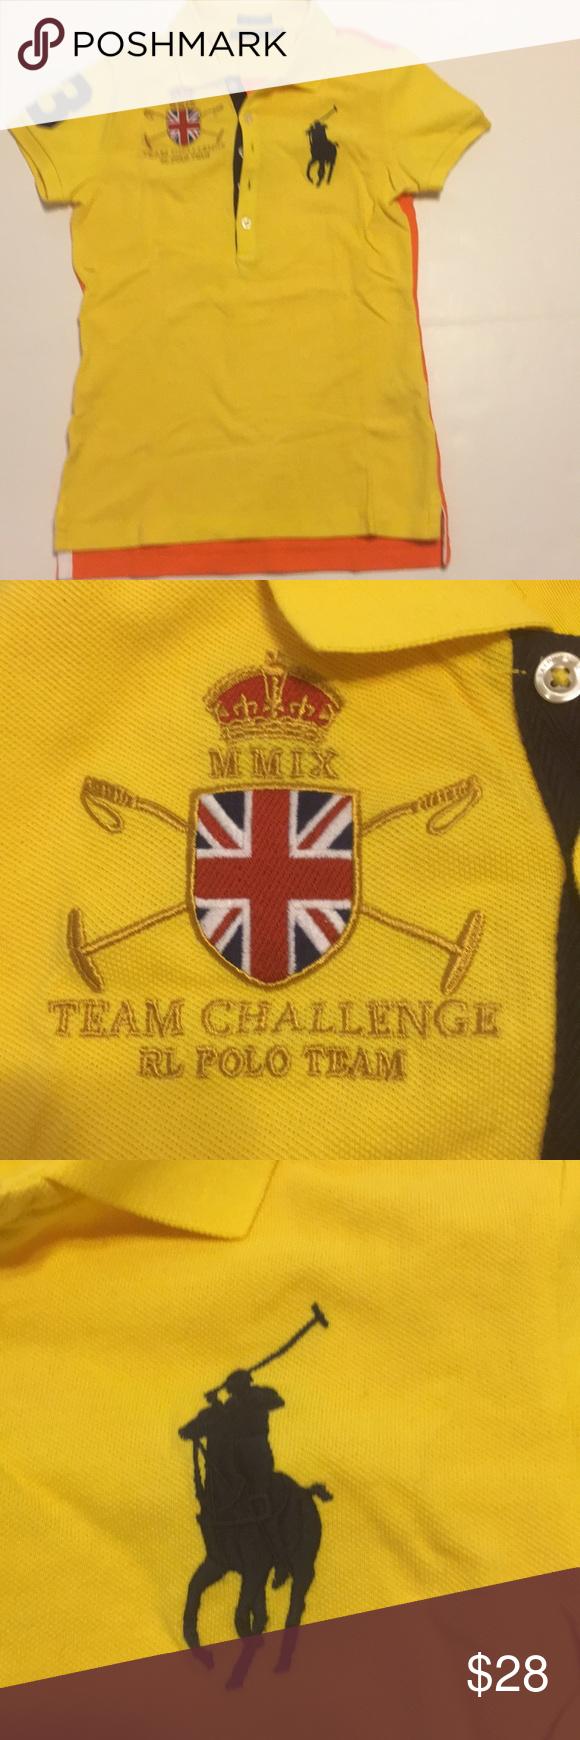 Shirt Skinny Lauren Challenge Polo Ralph The Team UVpLMGqSz